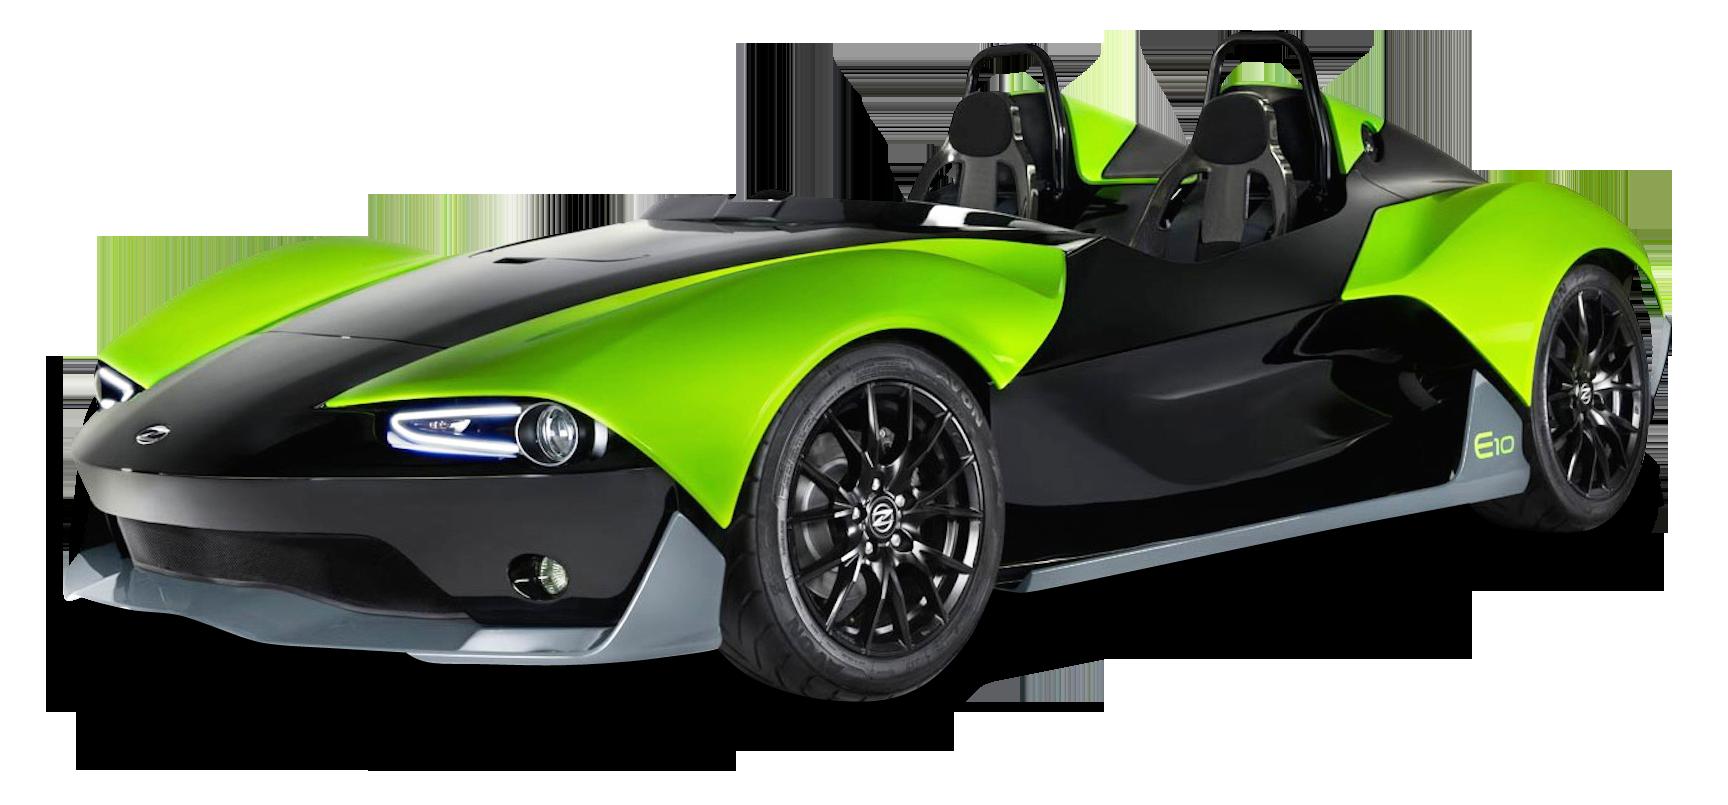 Zenos E10 Car British Sports Cars New Sports Cars Sports Car